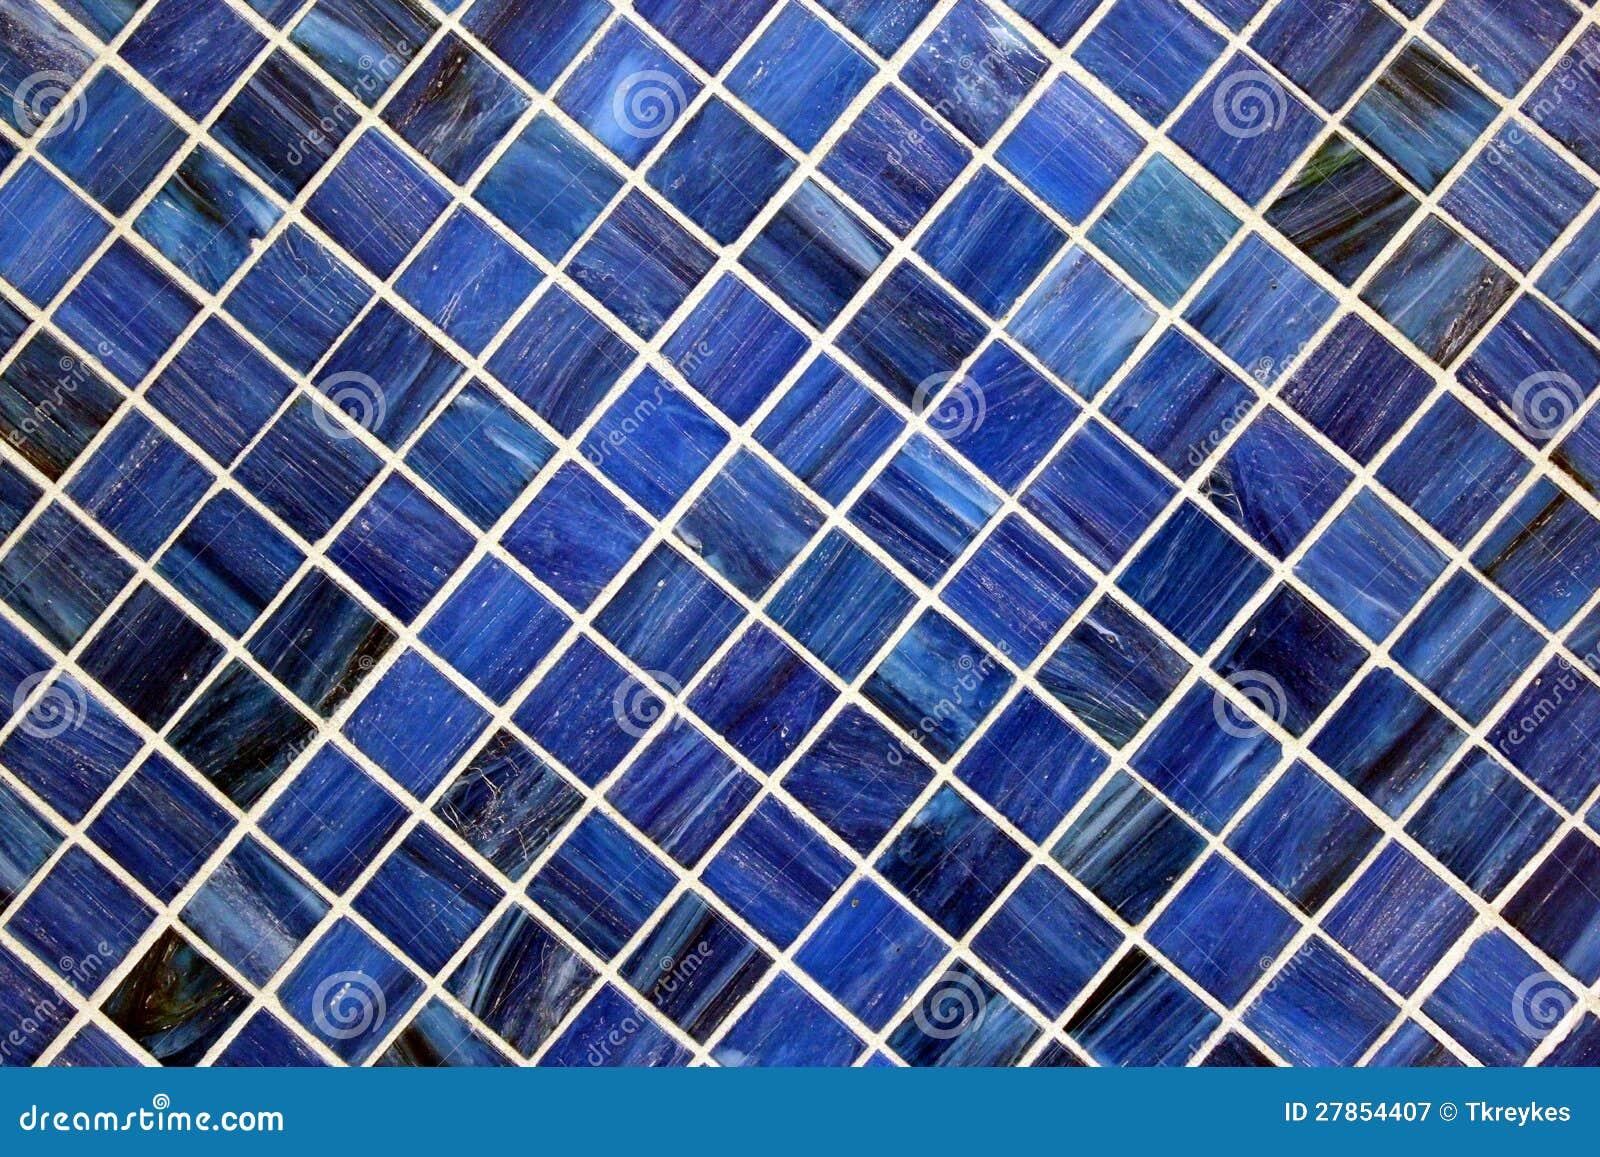 Dachówkowa błękit Tekstura